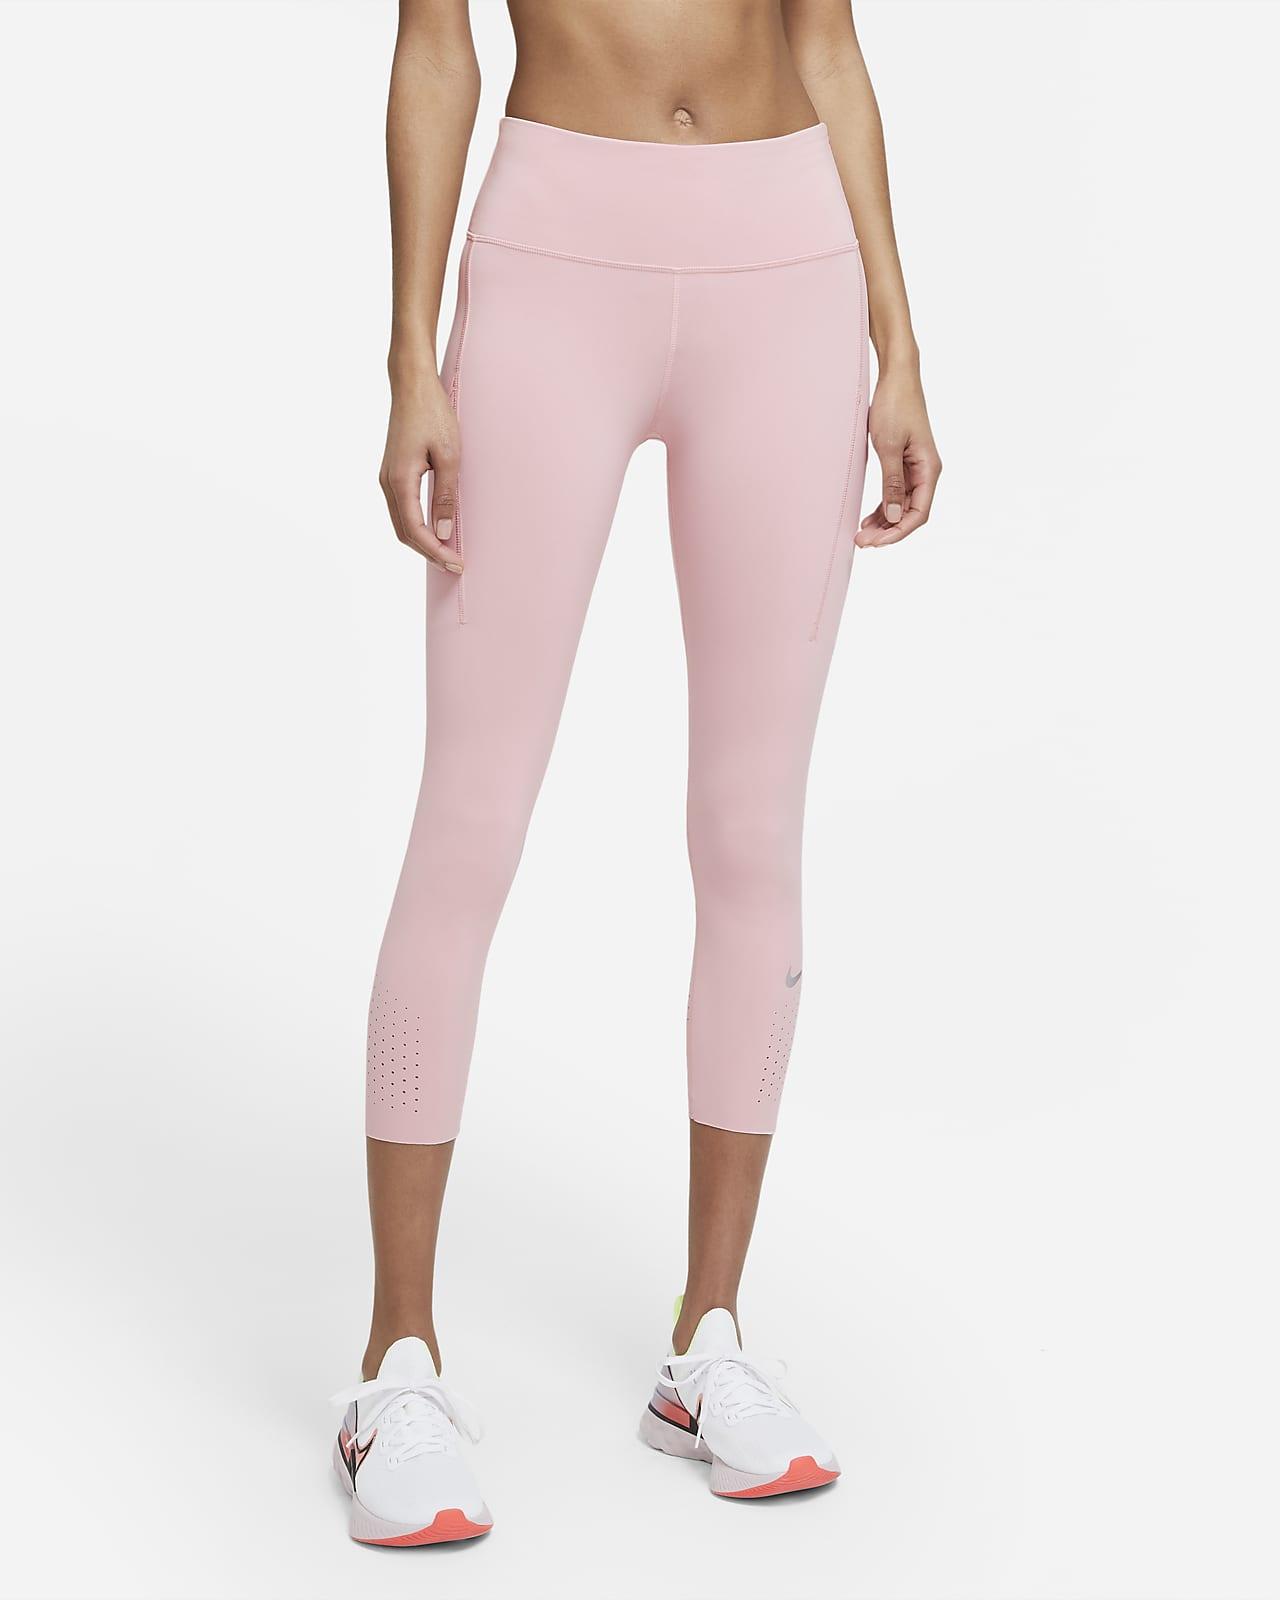 Nike Epic Luxe Women's Mid-Rise Crop Pocket Running Leggings